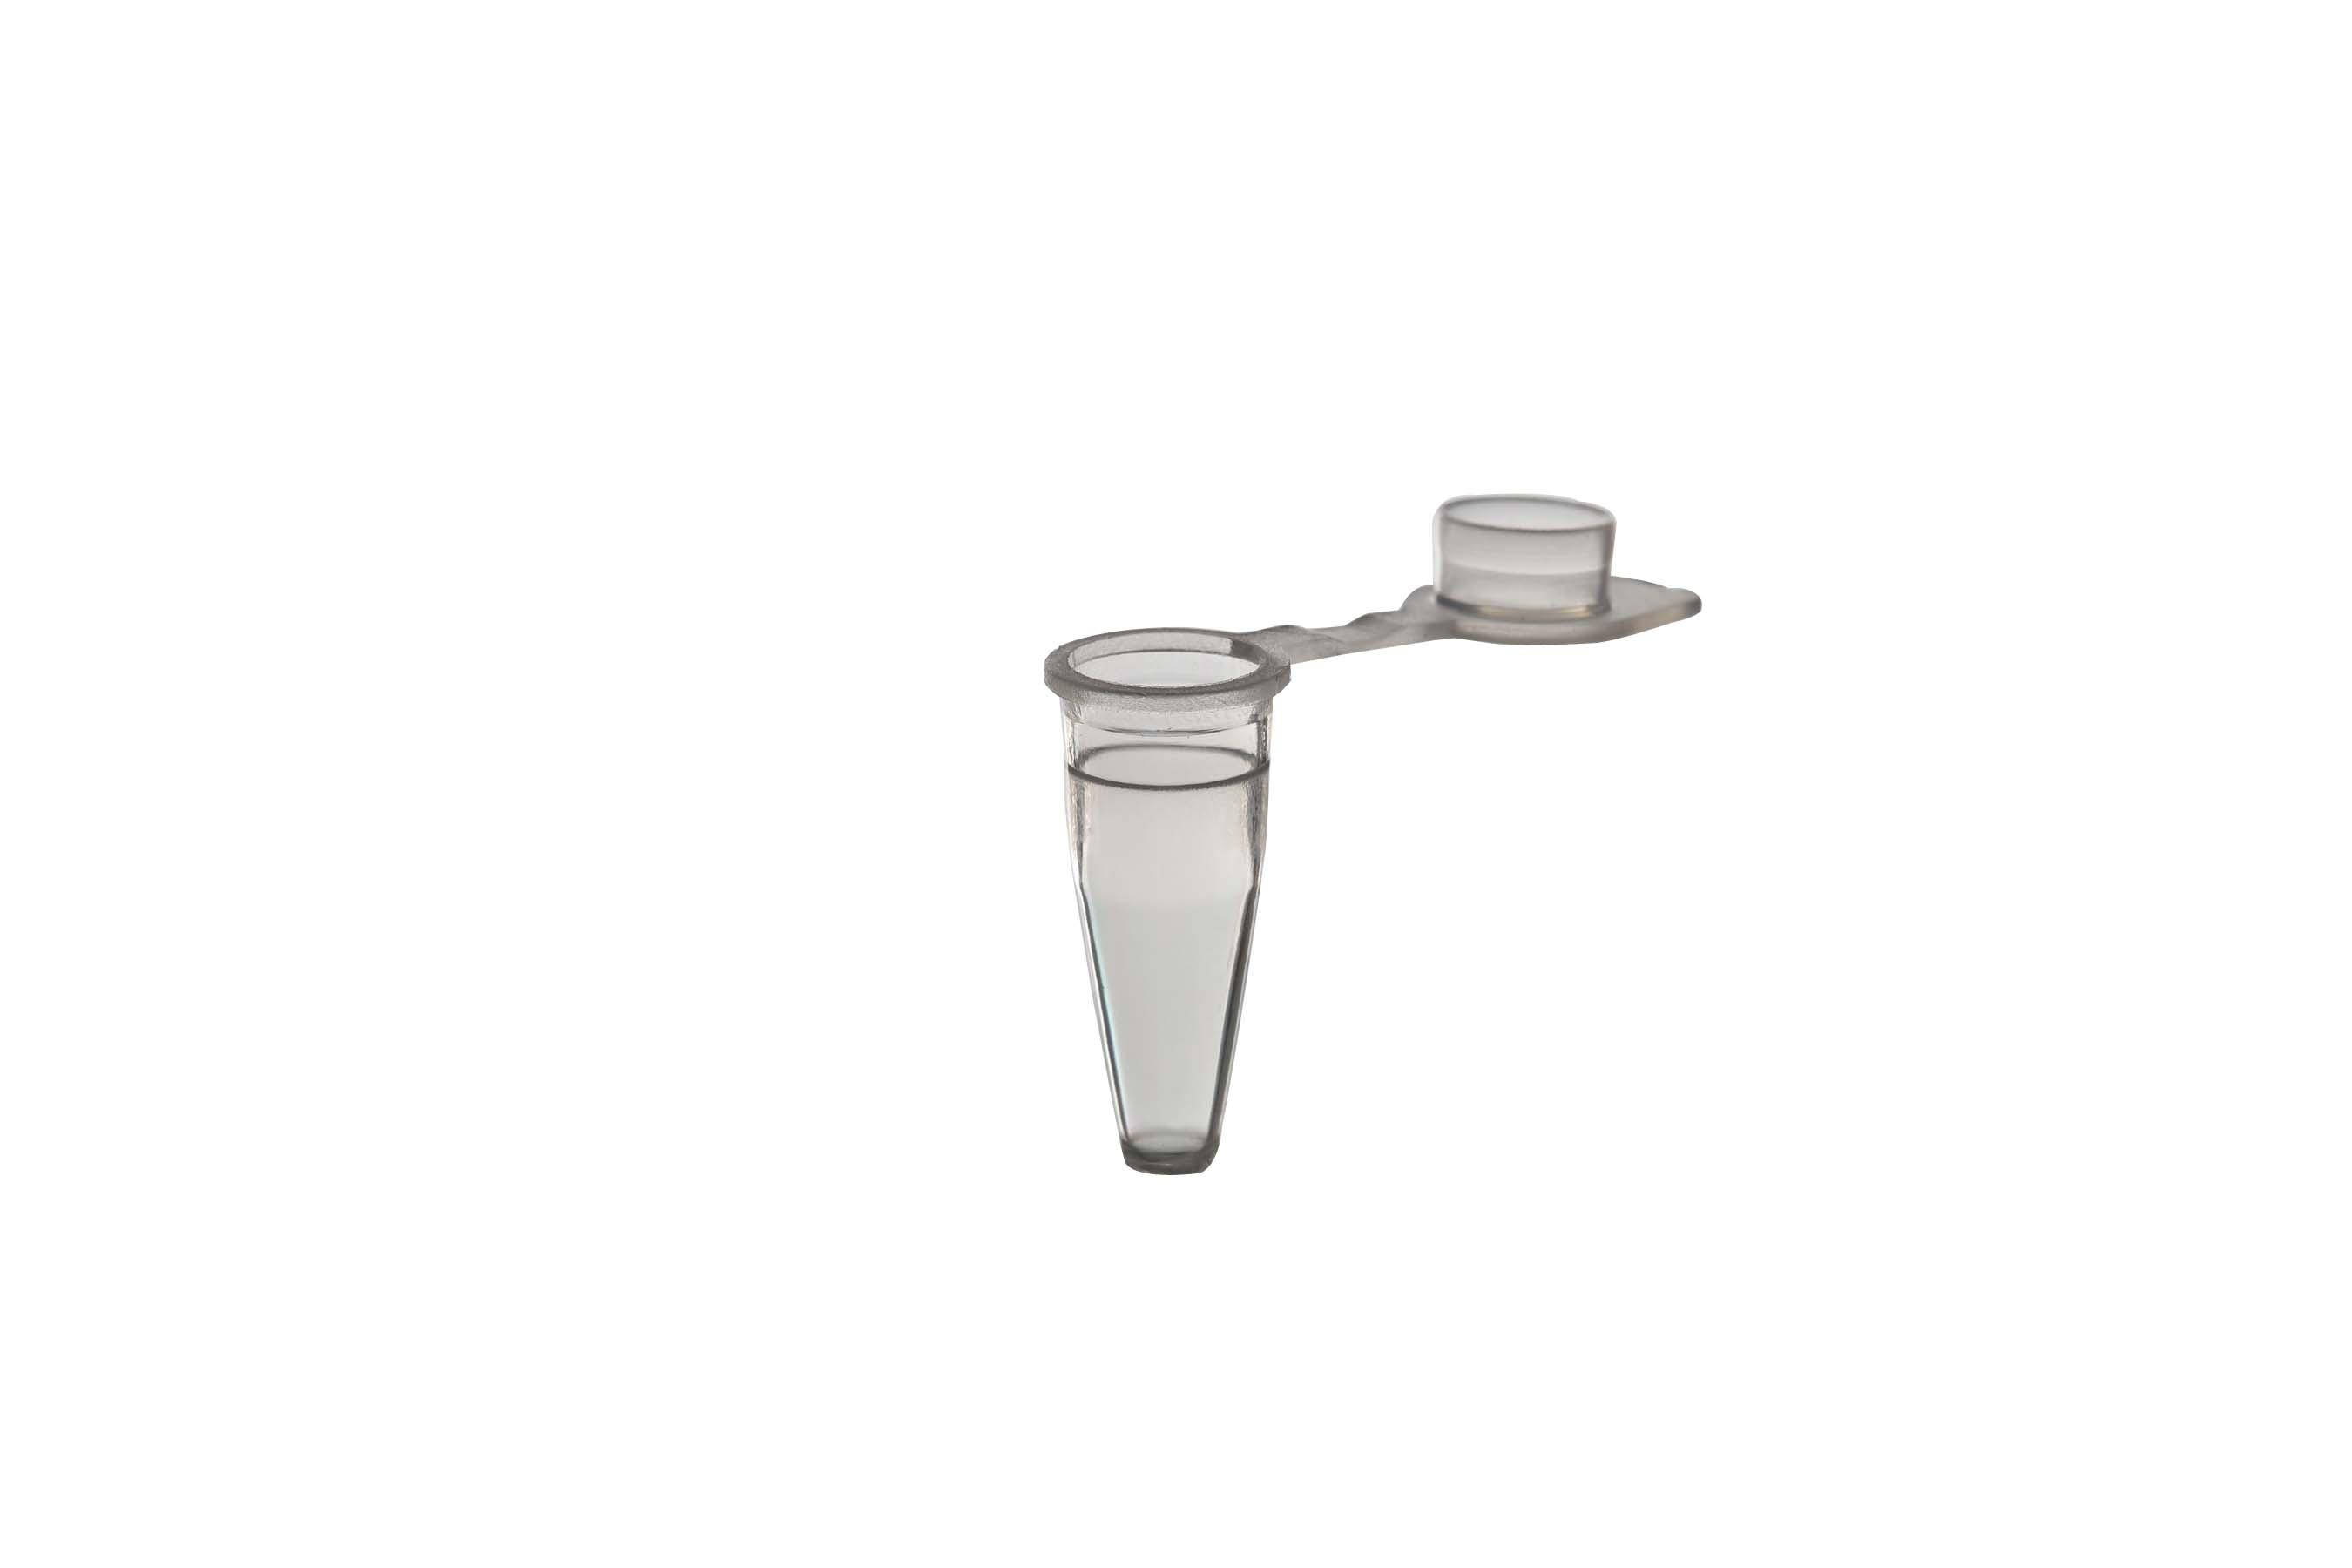 Expell PCR zkumavky 0,1 ml, v sáčku | Capp